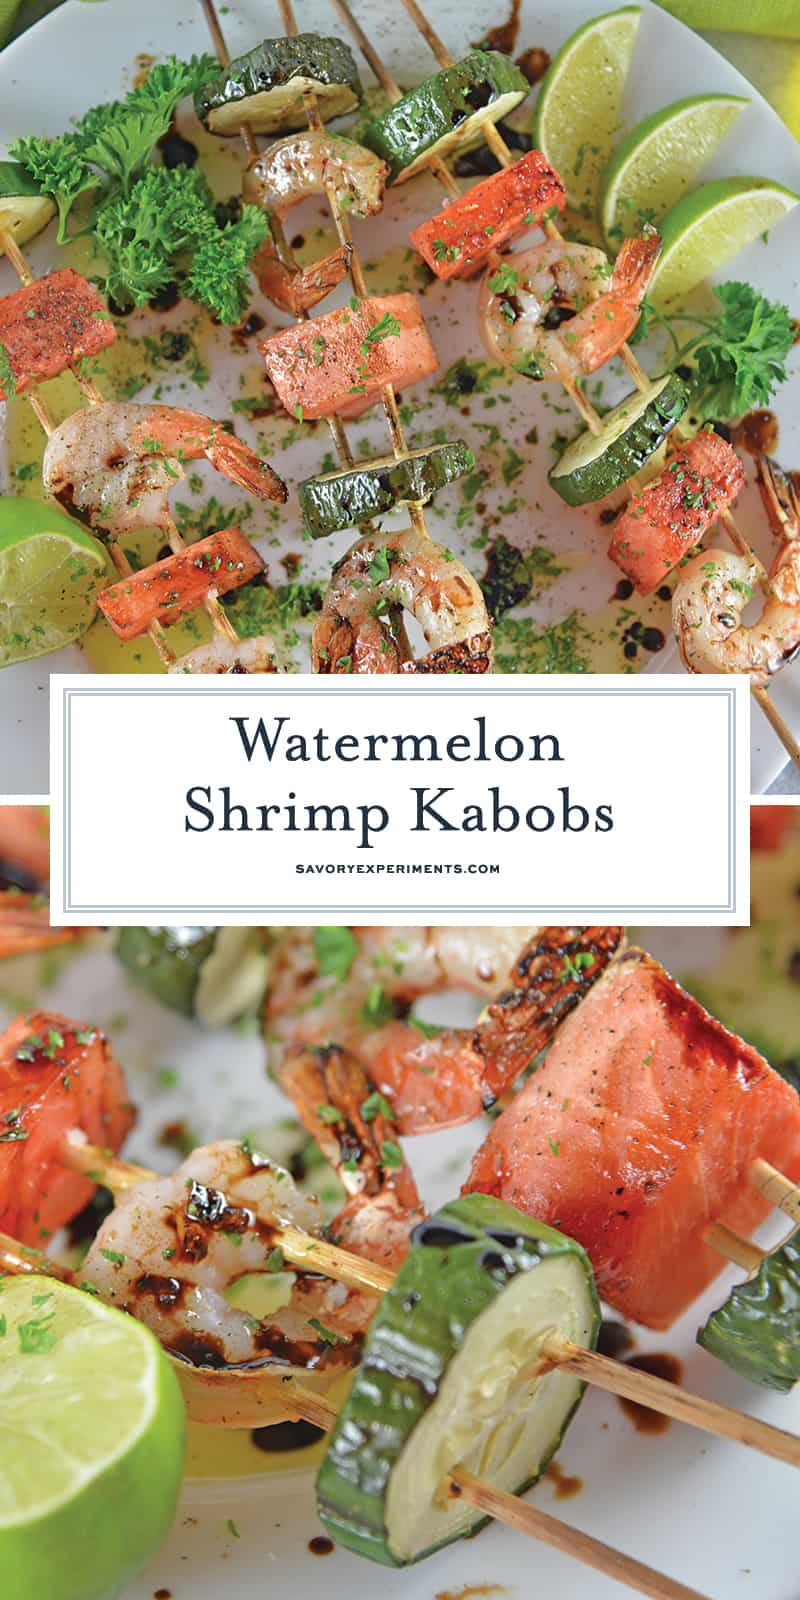 Watermelon Shrimp Kabobs combine grilled shrimp with grilled watermelon with a sweet balsamic reduction and zesty lime. A healthy kabob recipe on the grill. #grilledwatermelon #kabobrecipes www.savoryexperiments.com